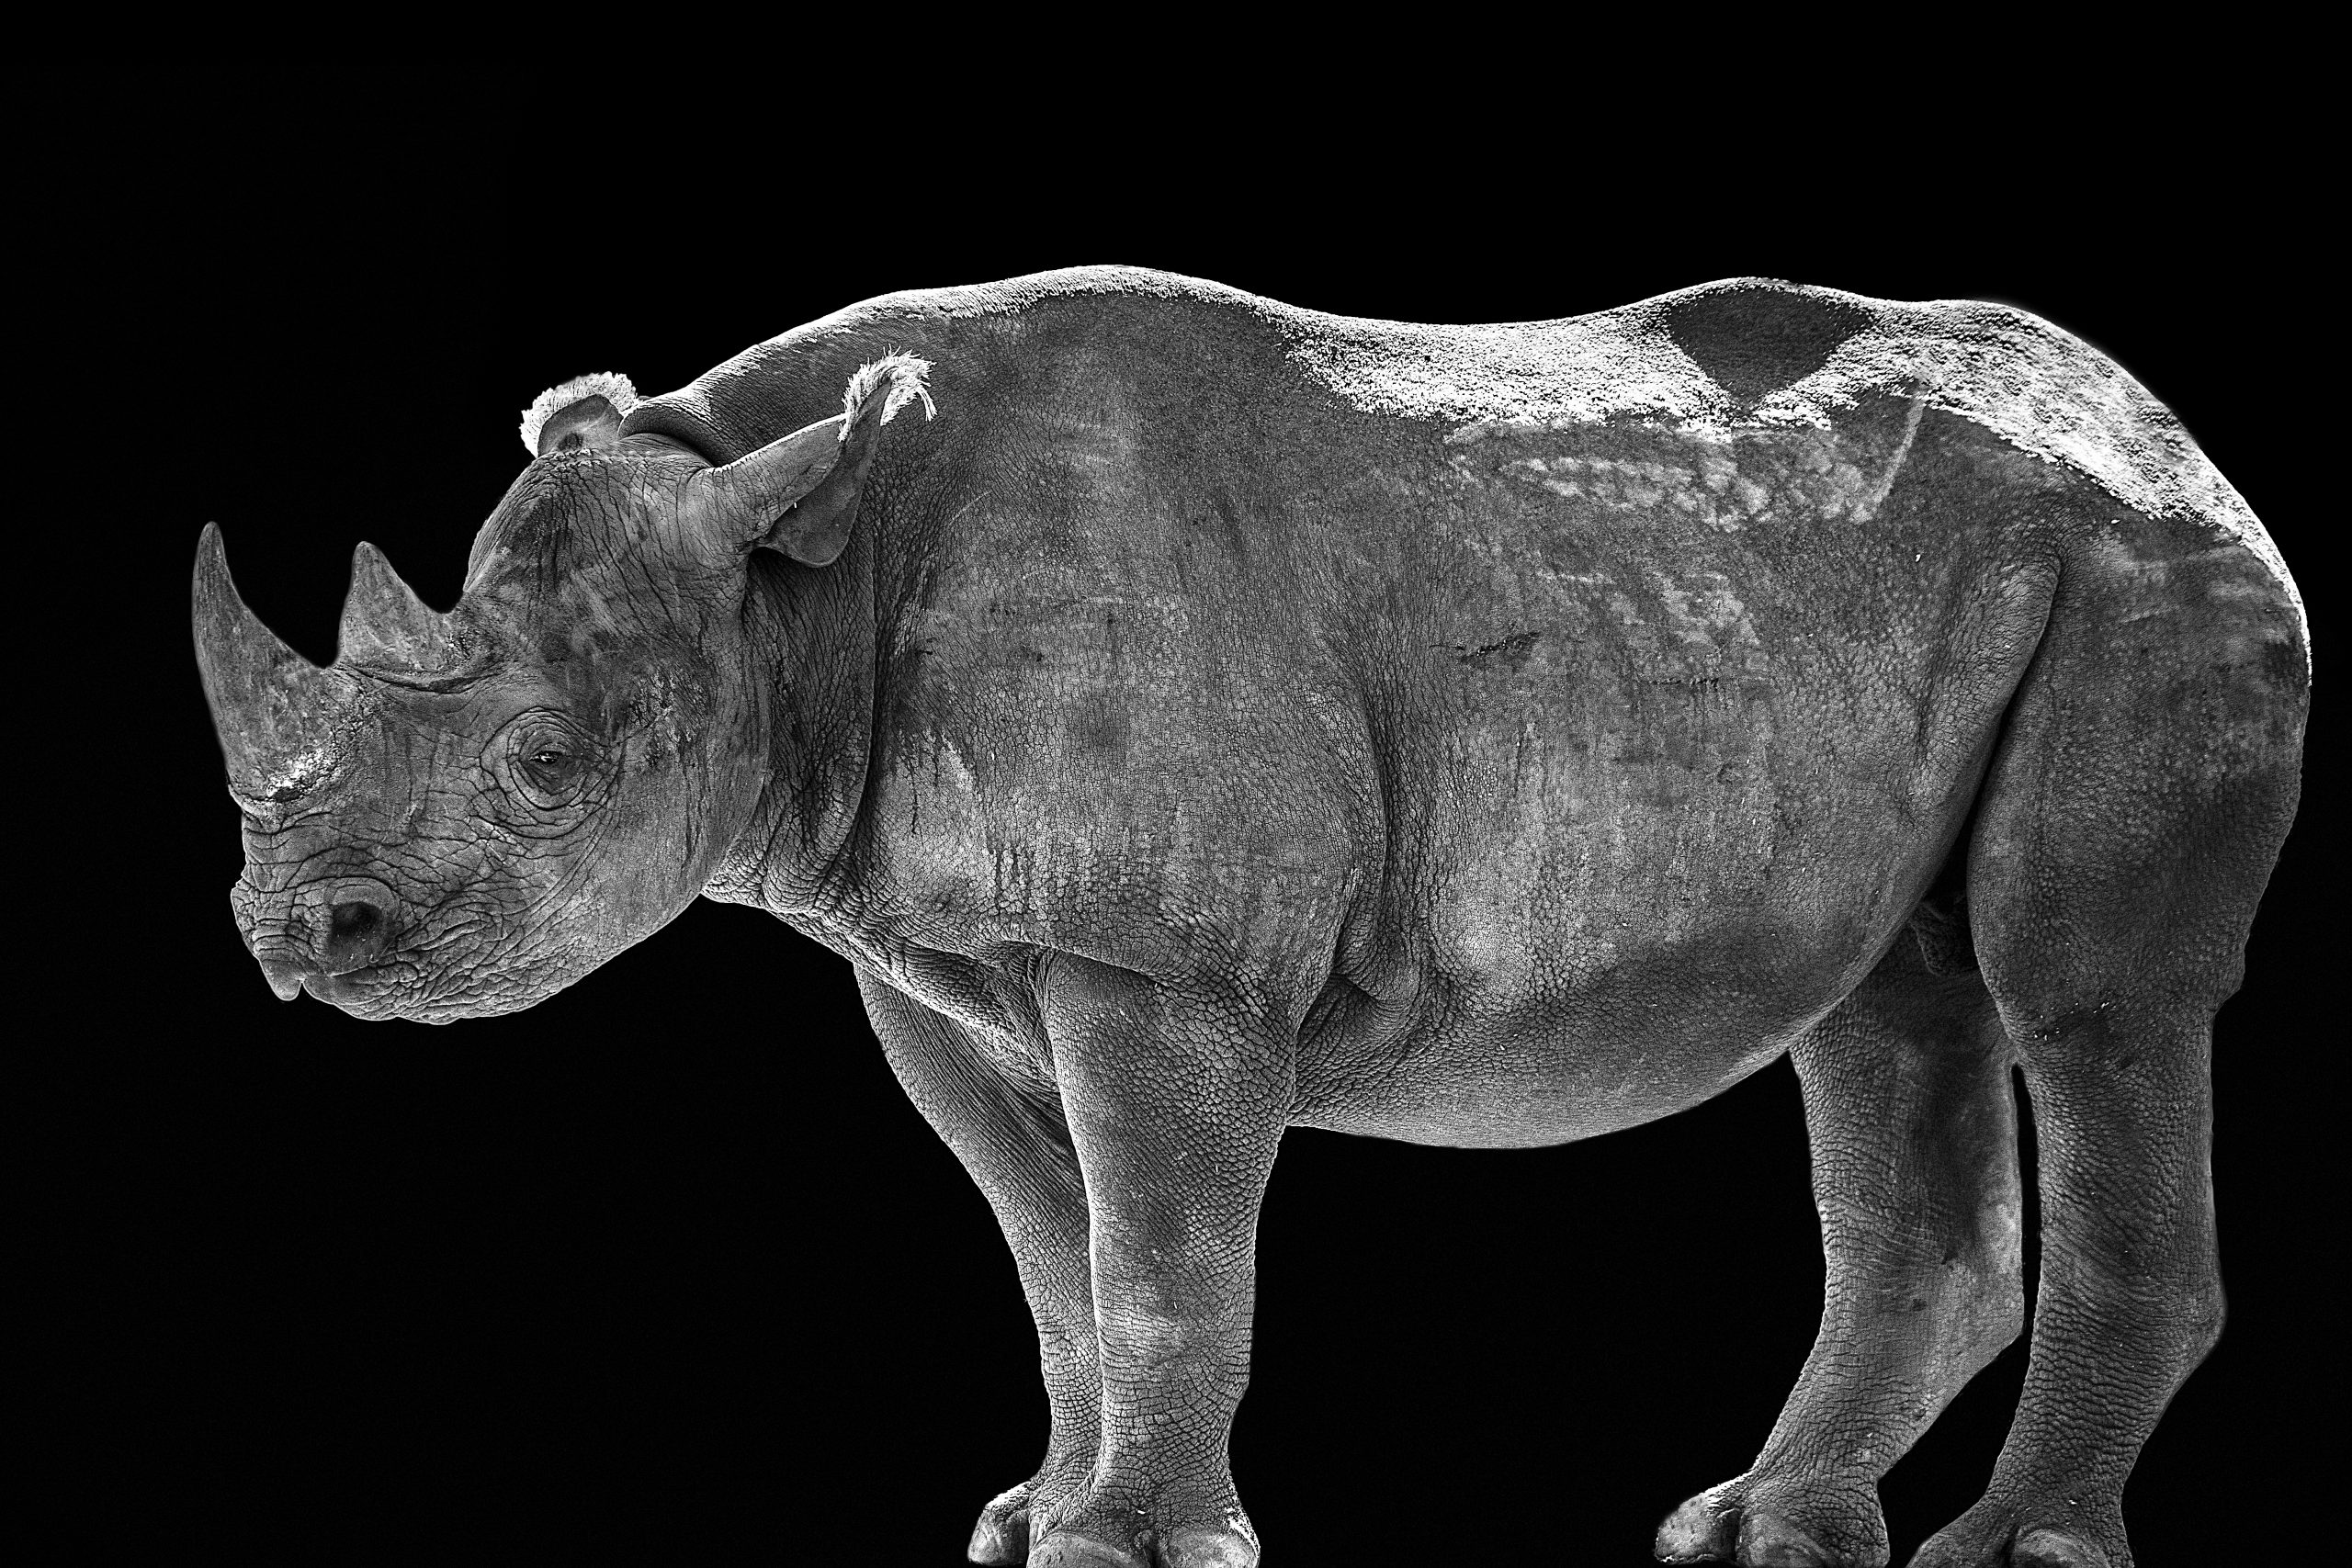 Rhino2690abcdef